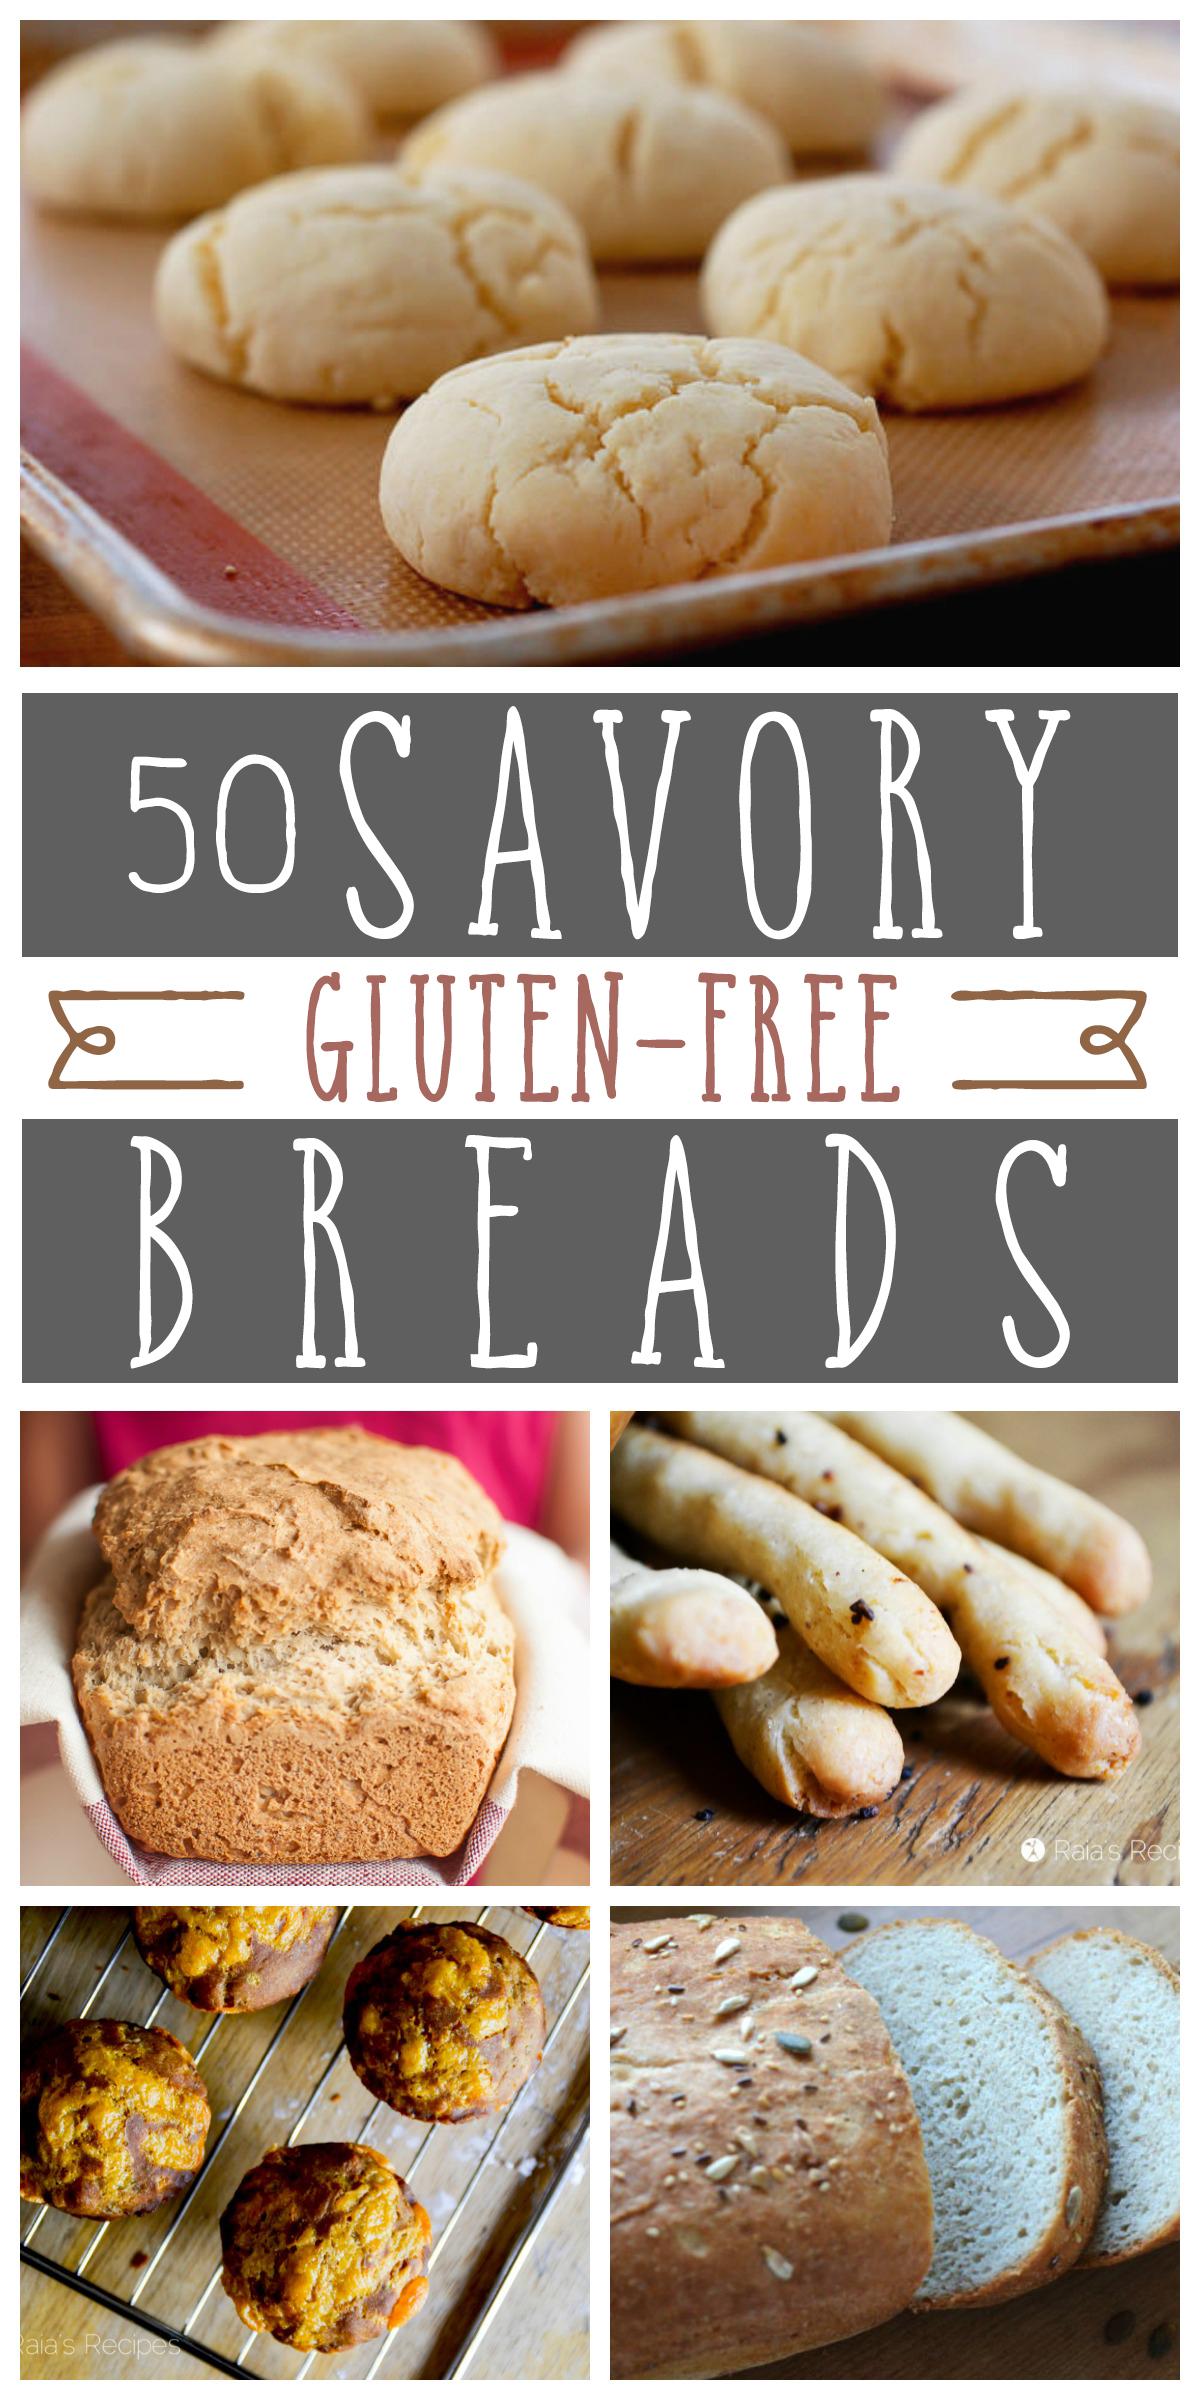 50 Savory Gluten Free Breads